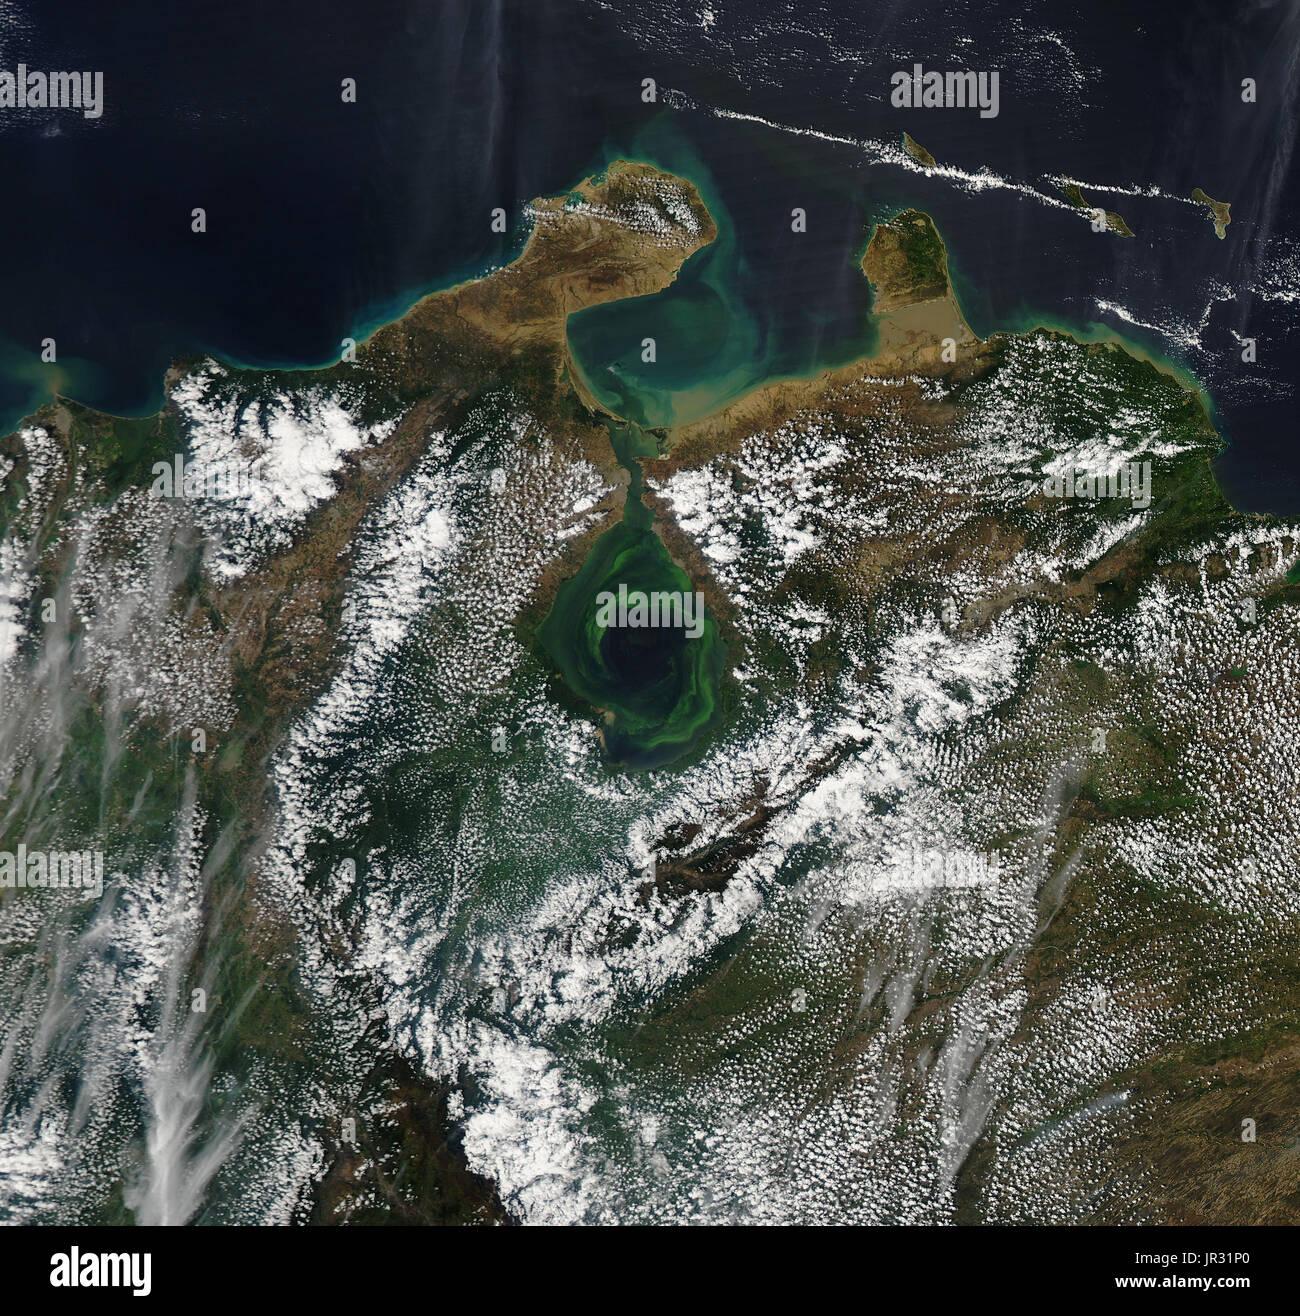 Lake Maracaibo: geographical location, description, origin 2